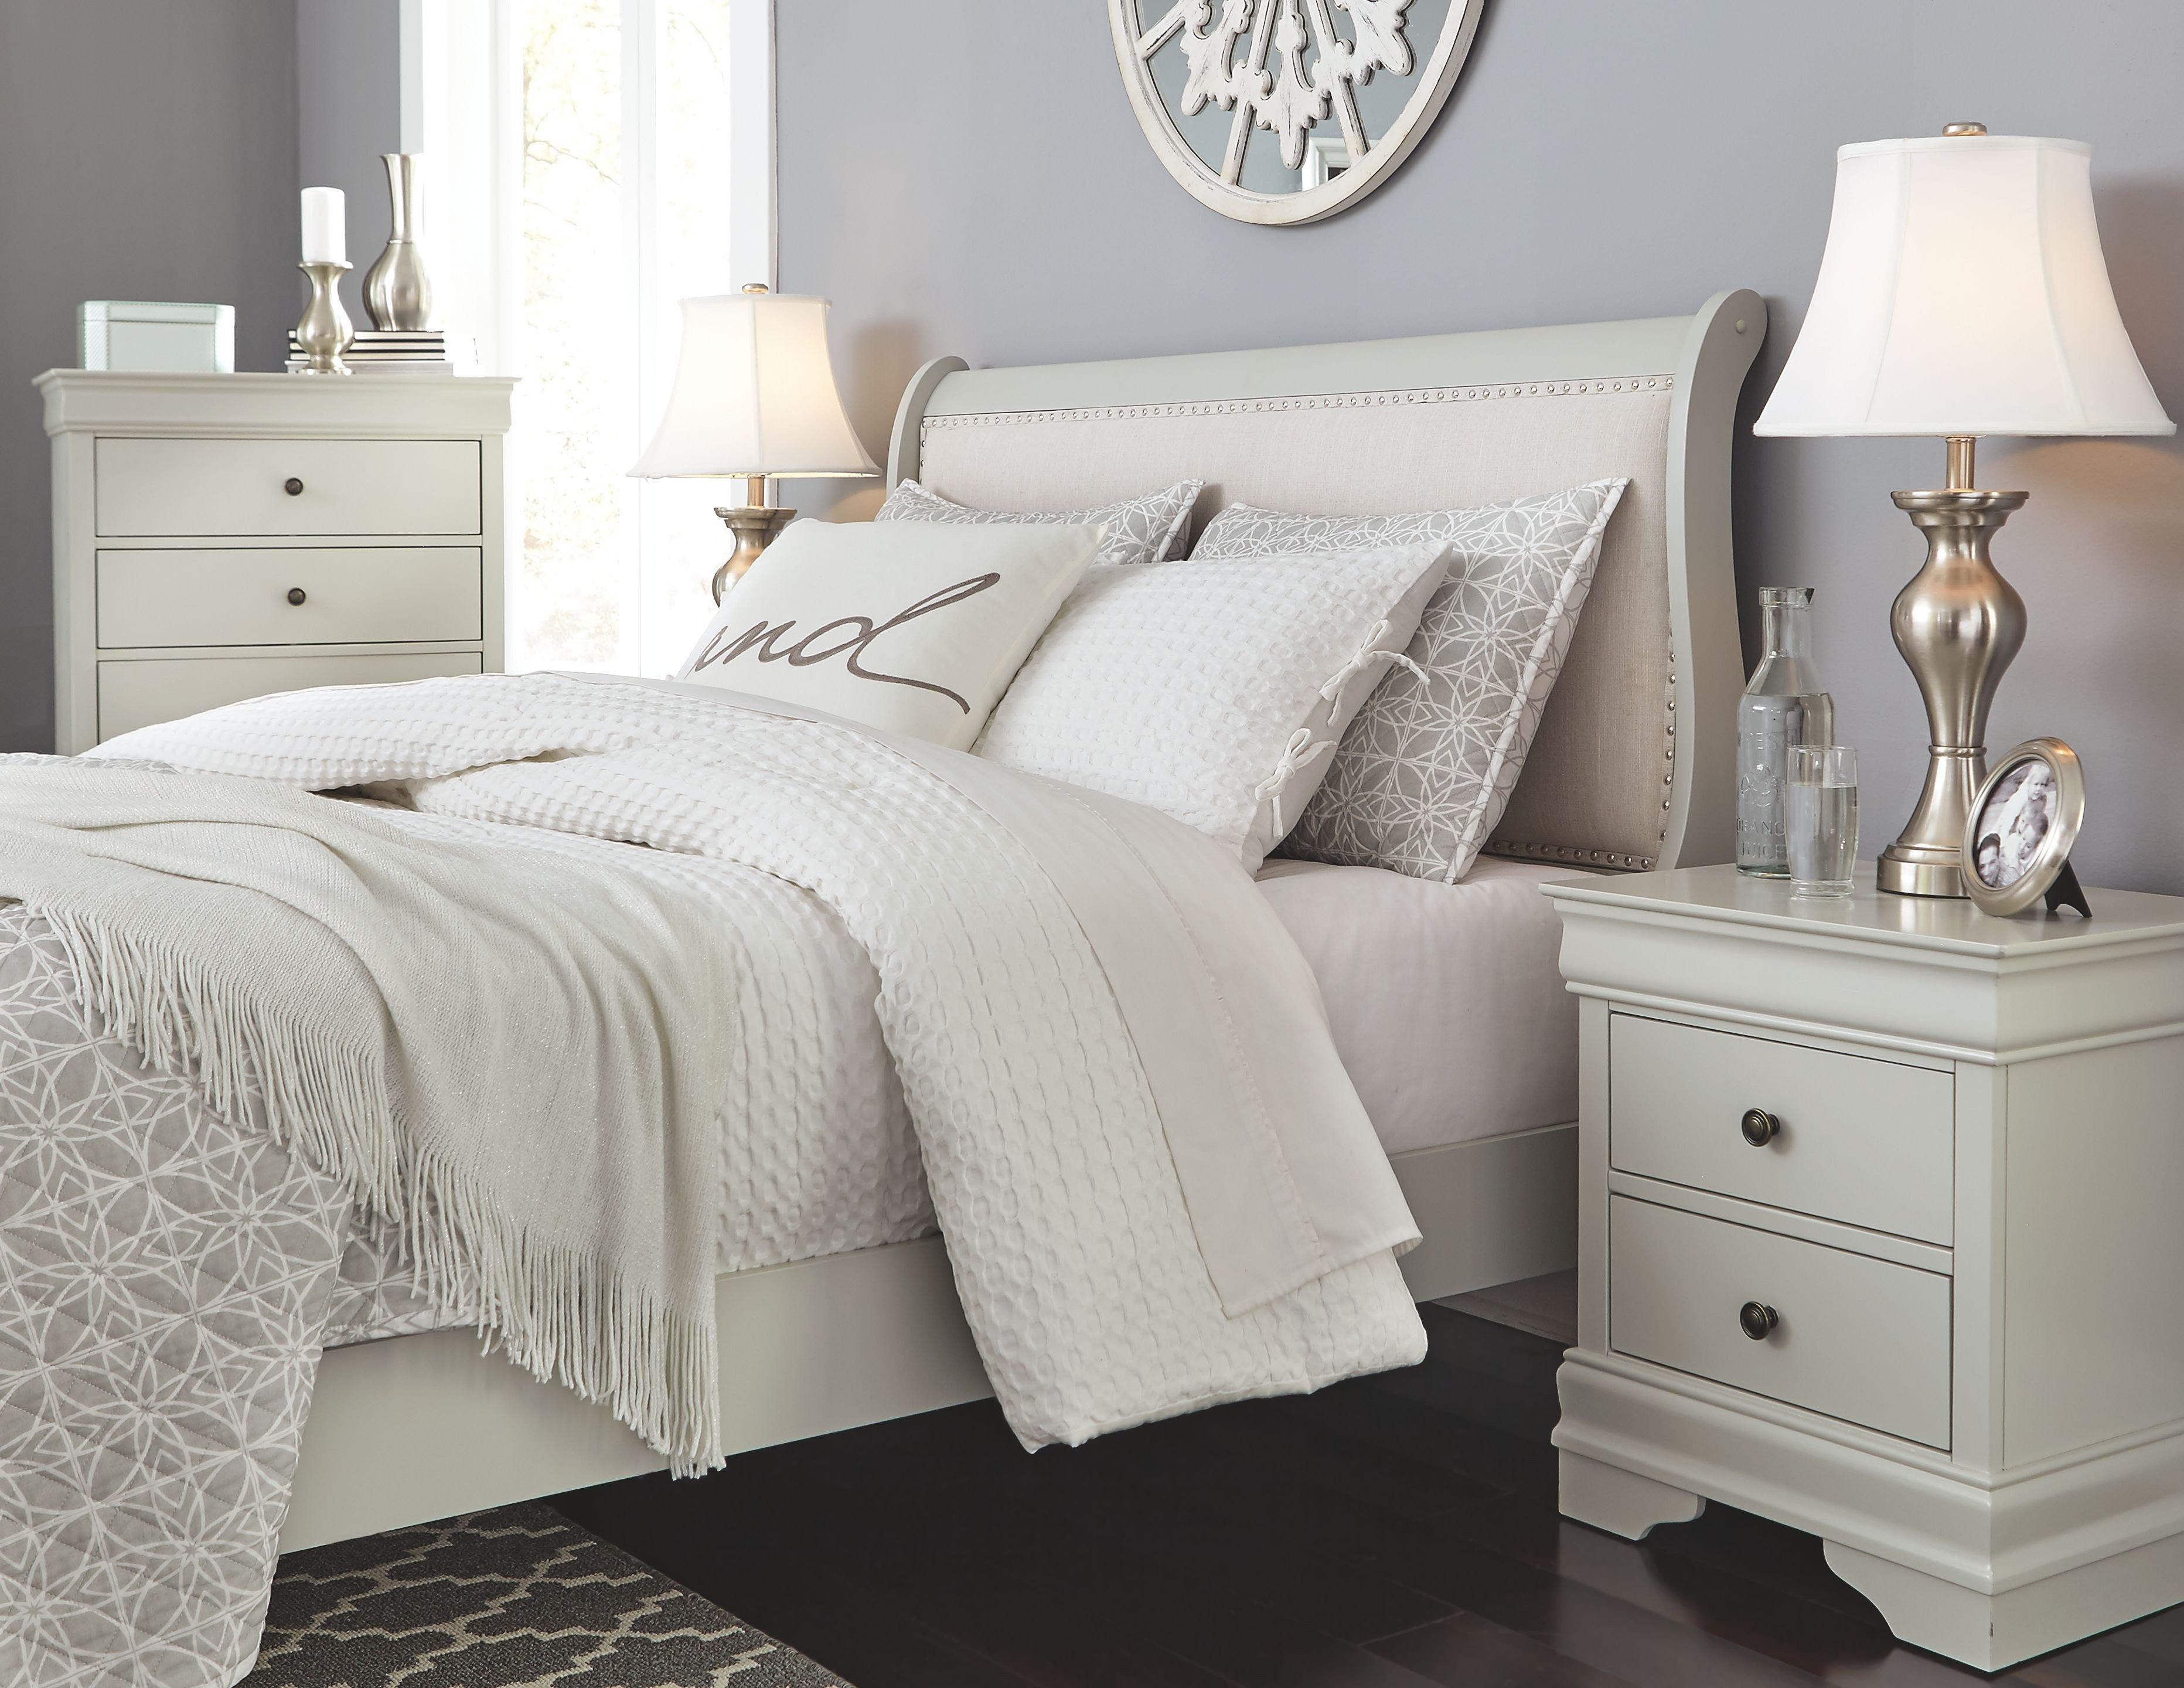 Ashley Black Bedroom Set Inspirational Jorstad Full Bed with 2 Nightstands Gray